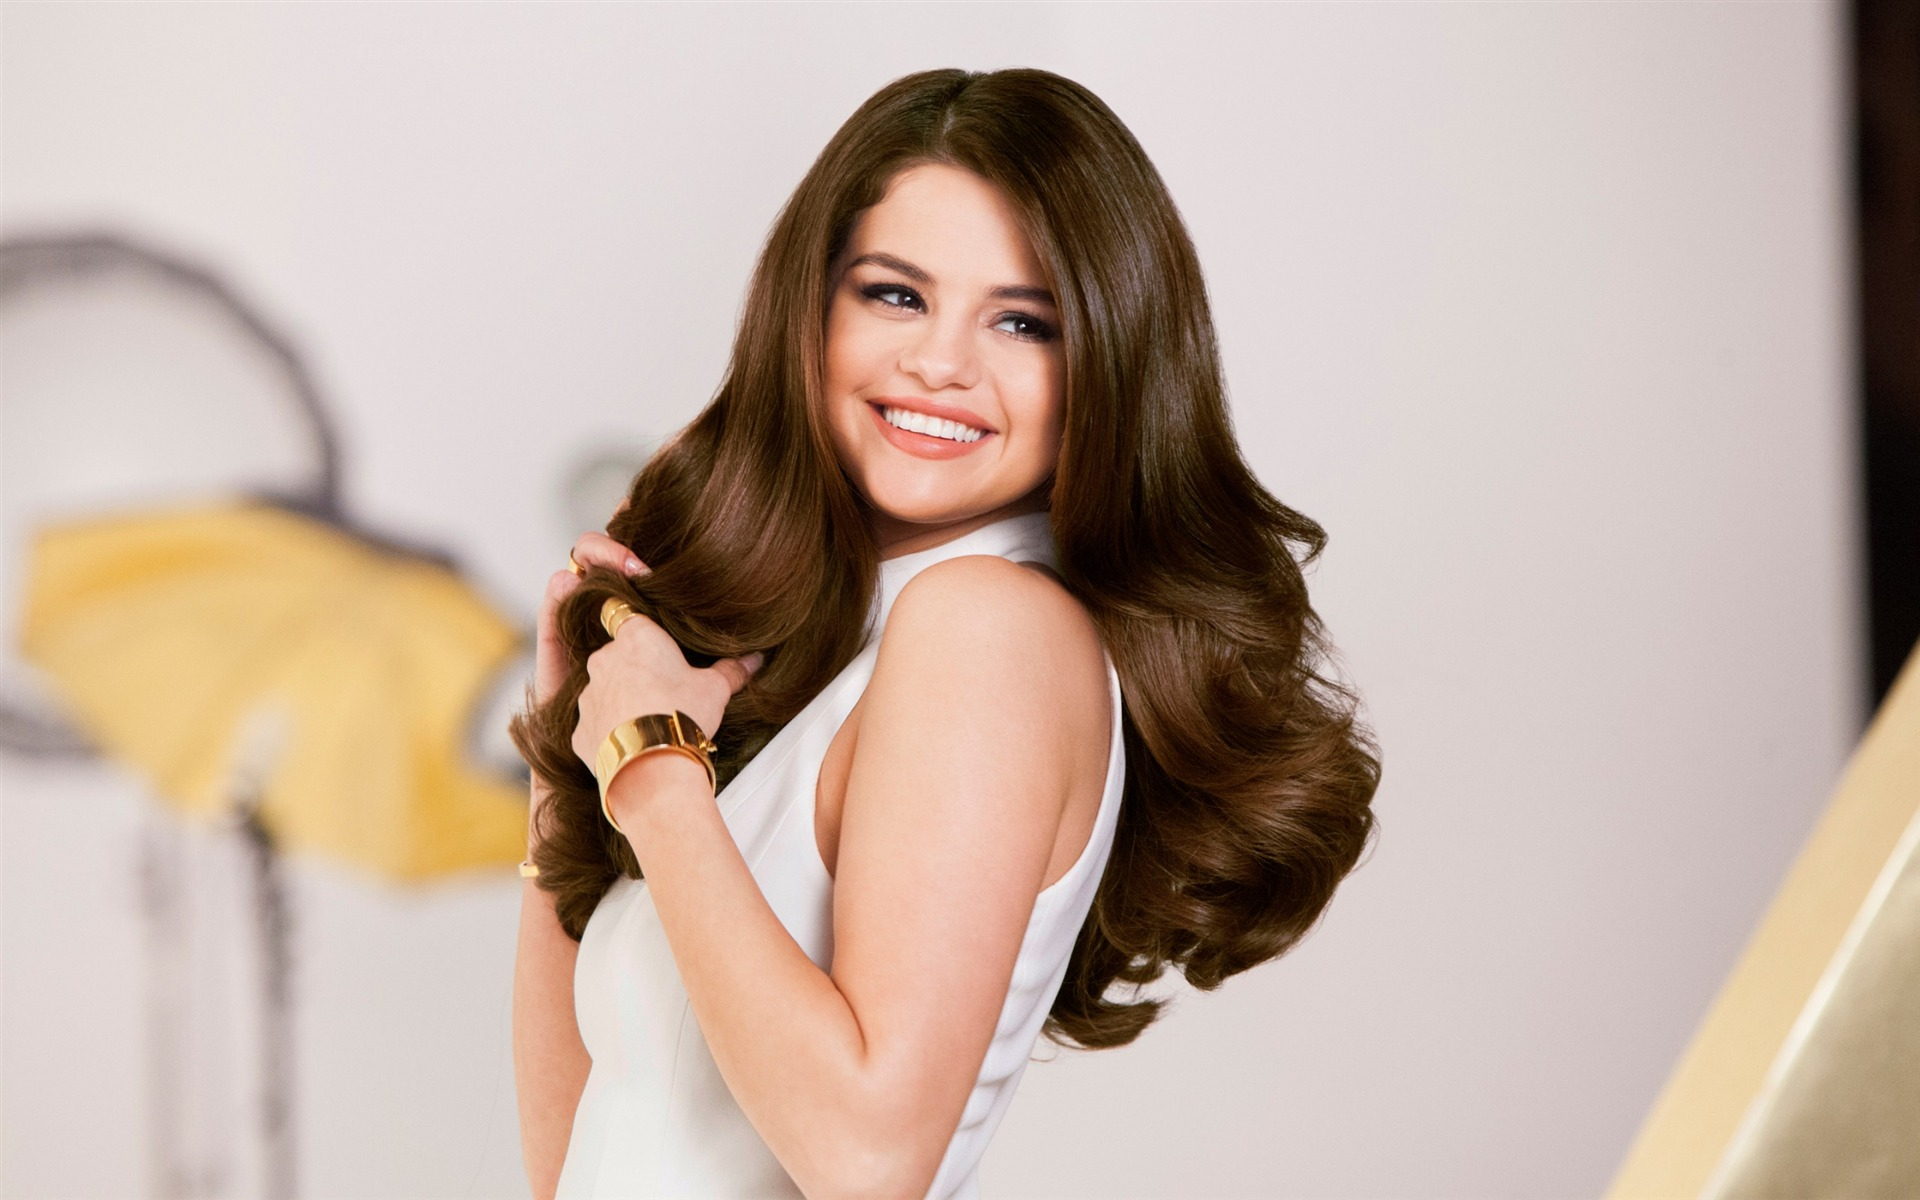 Selena Gomez Pantene Actriz Model Photo Wallpaper Avance